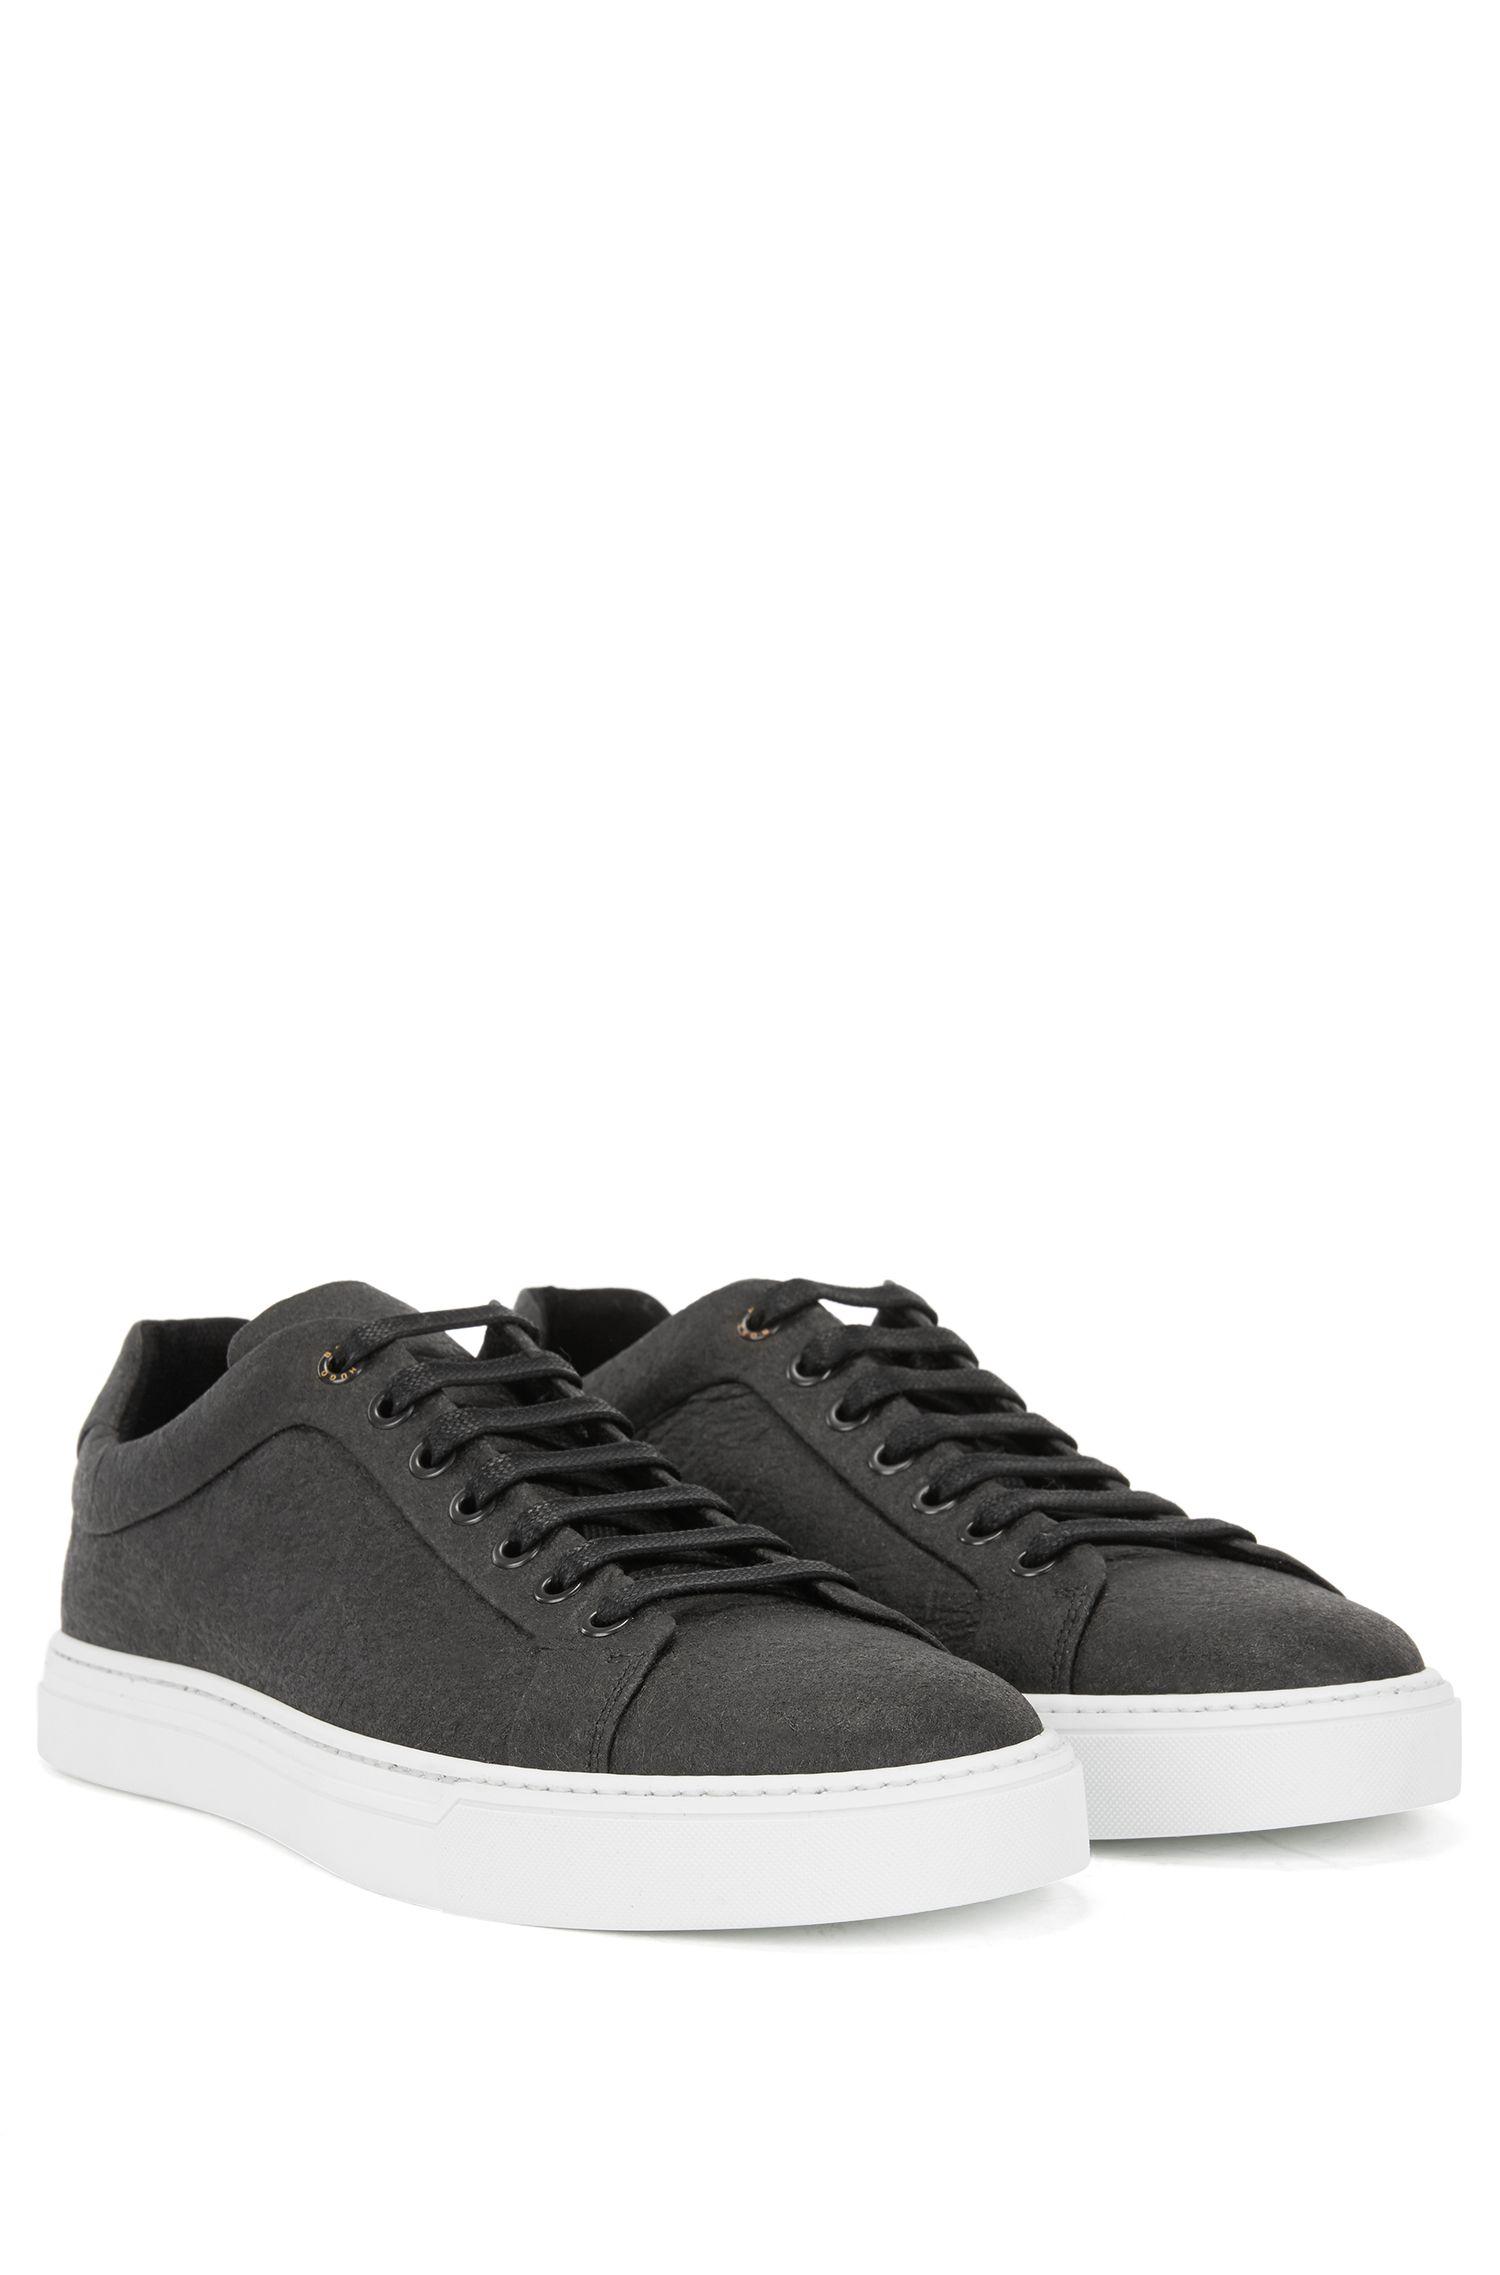 Limited-edition 100% vegan sneakers in Piñatex®, Black